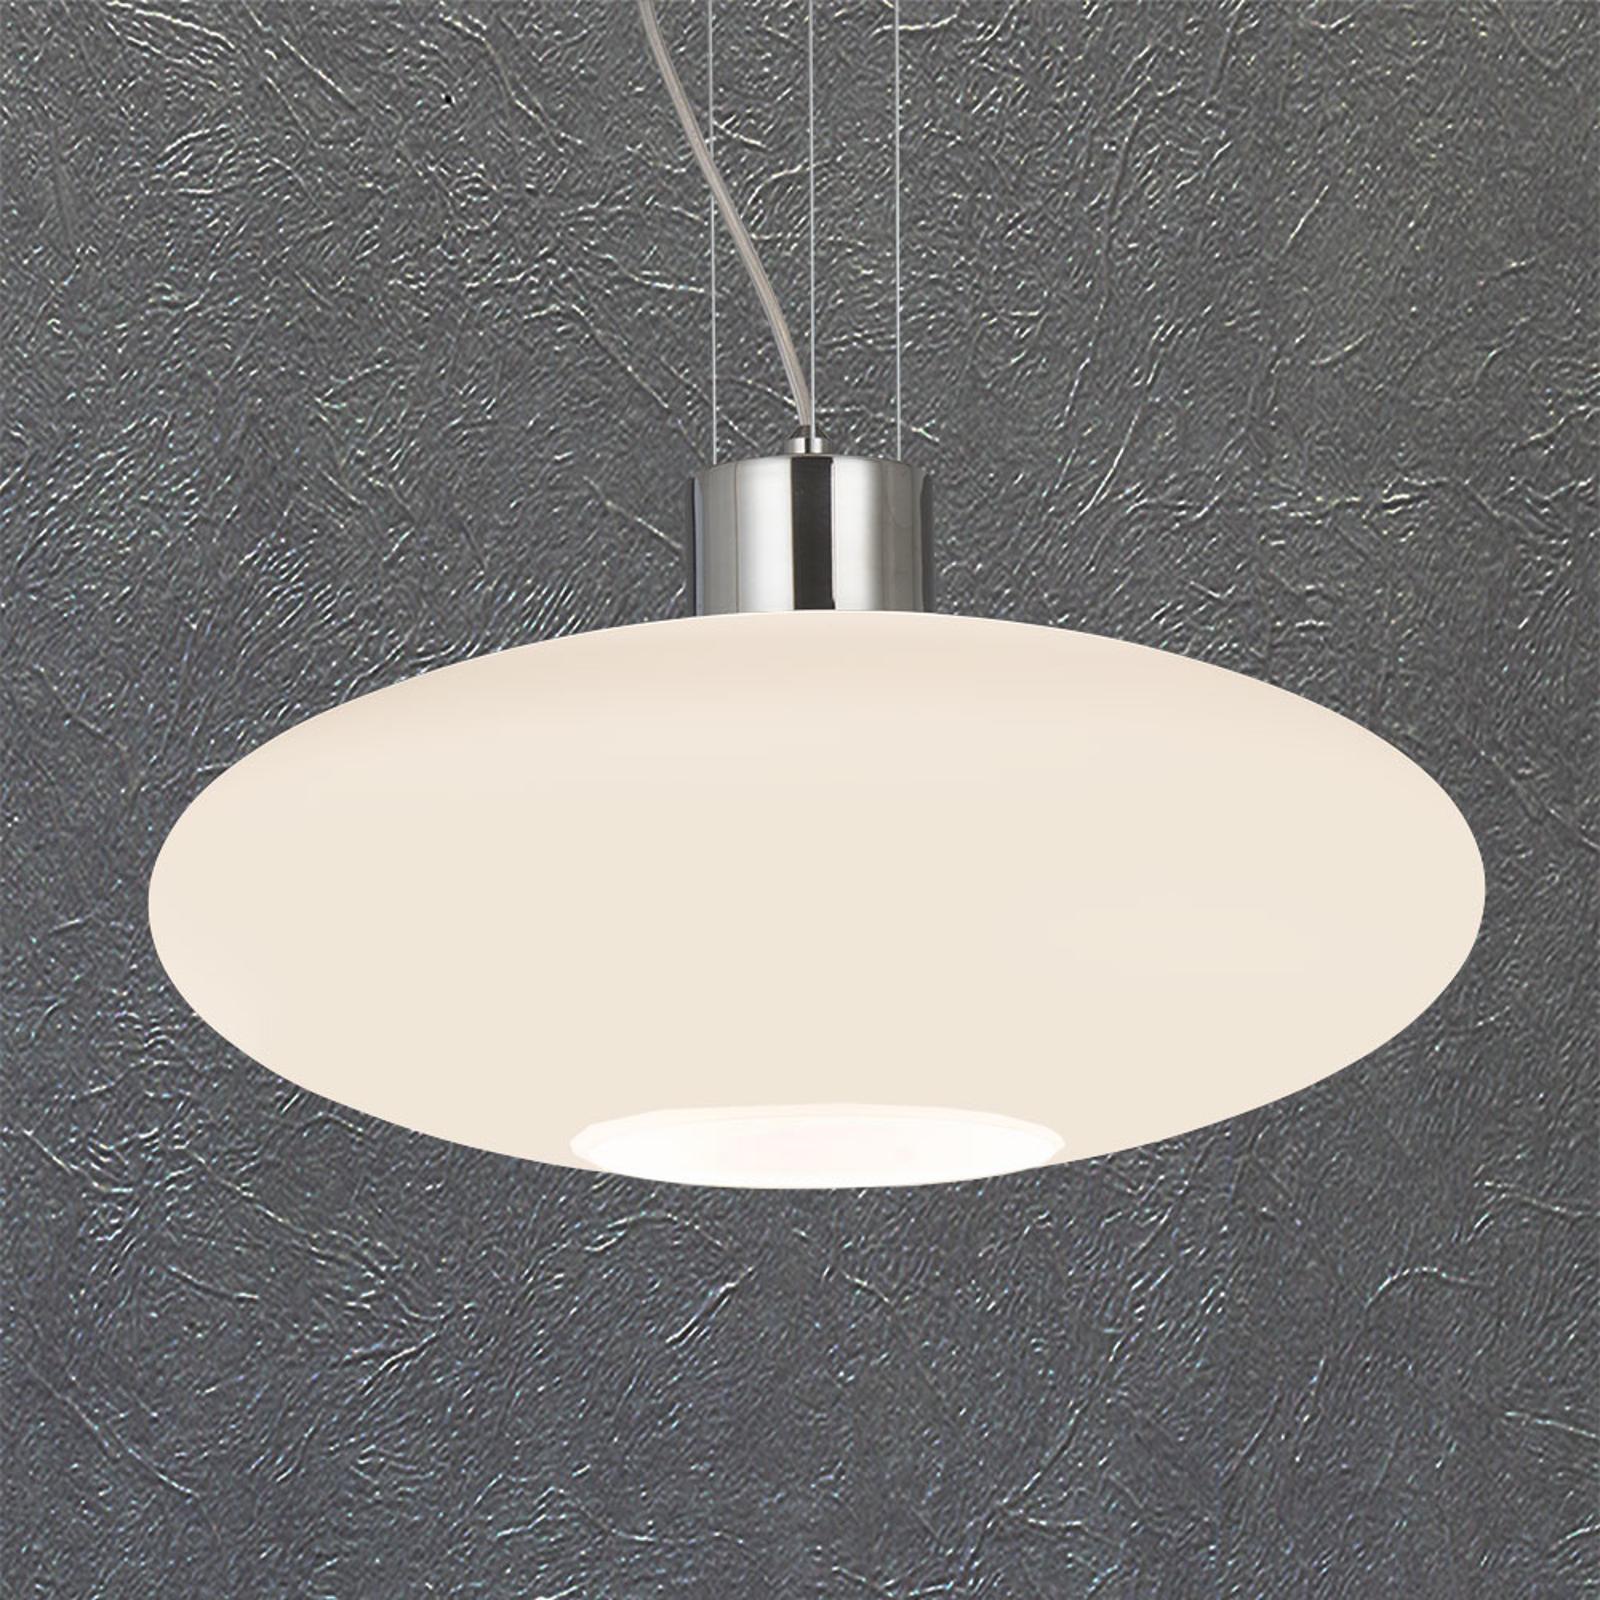 Hanglamp Boop in elegante vorm 40 cm